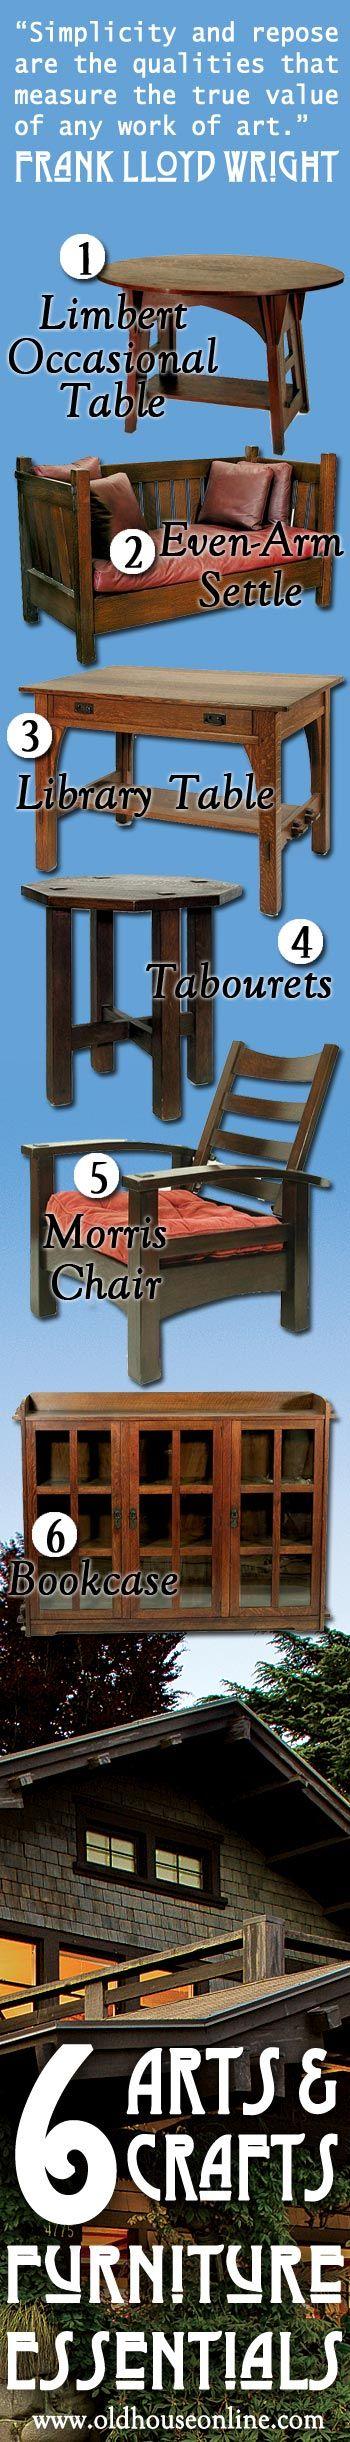 furniture for craftsman style home. 6 arts u0026 crafts furniture essentials craftsman furnituremission furnitureamerican craftsmancraftsman stylecraftsman homesarts for style home